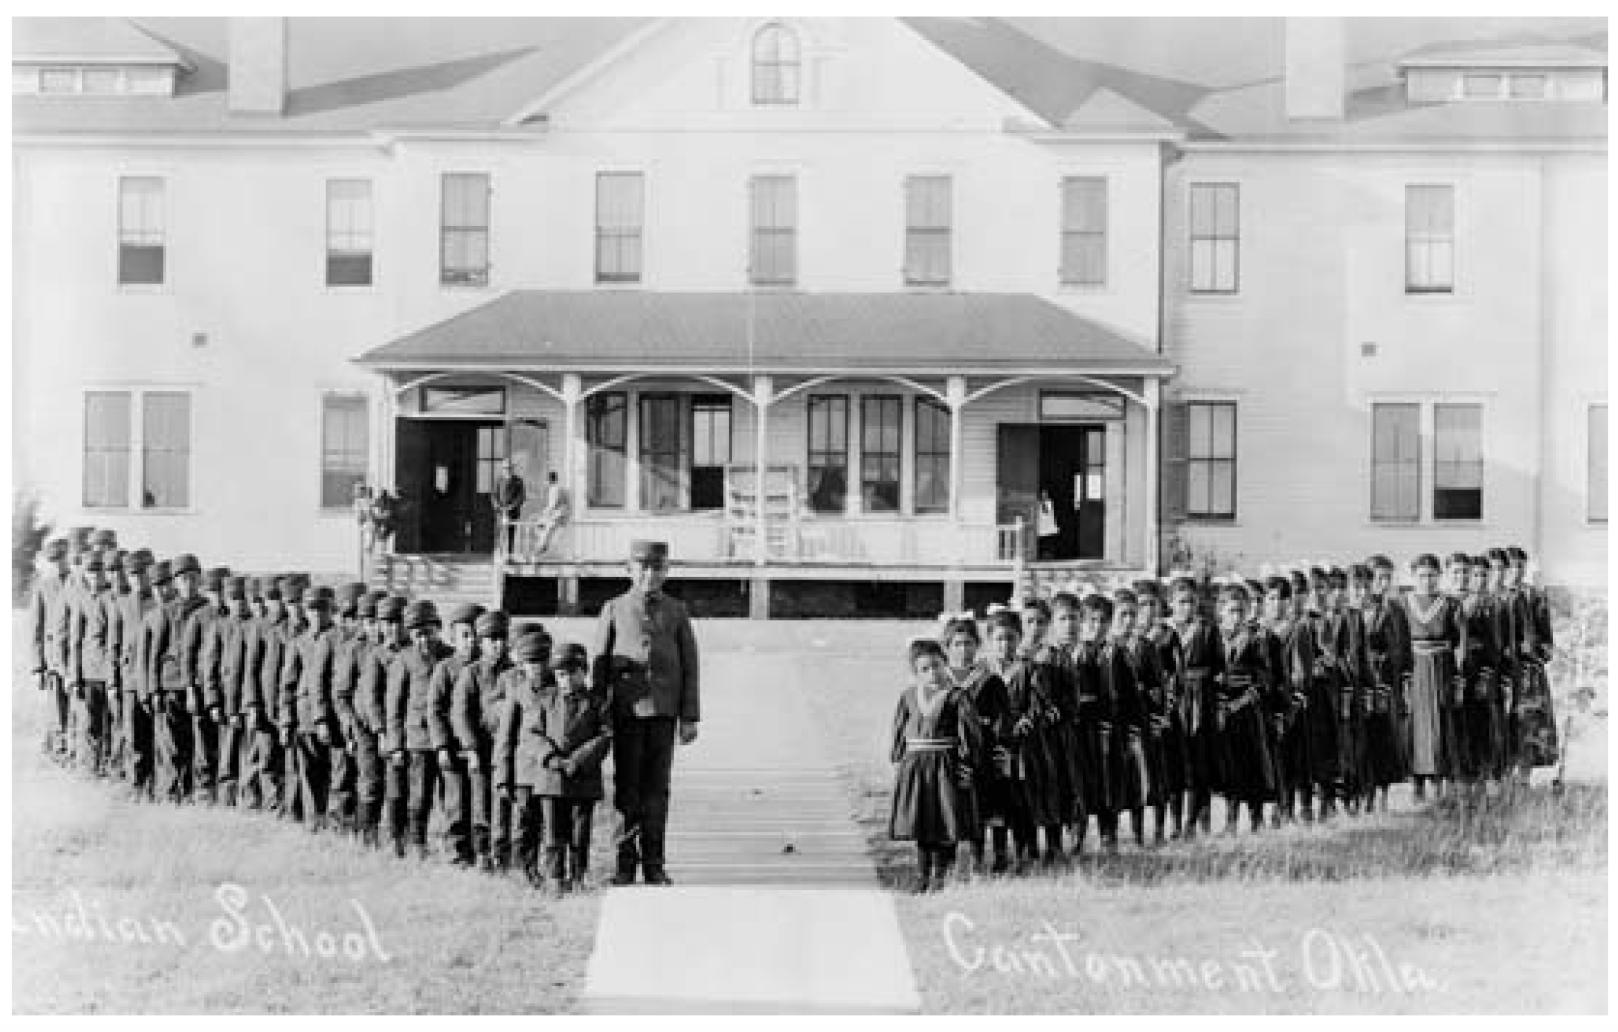 Indian boarding school at Cantonment, Oklahoma, ca. 1909. Library of Congress, Washington, D.C. (Neg. no. LC-USZ62-126134).